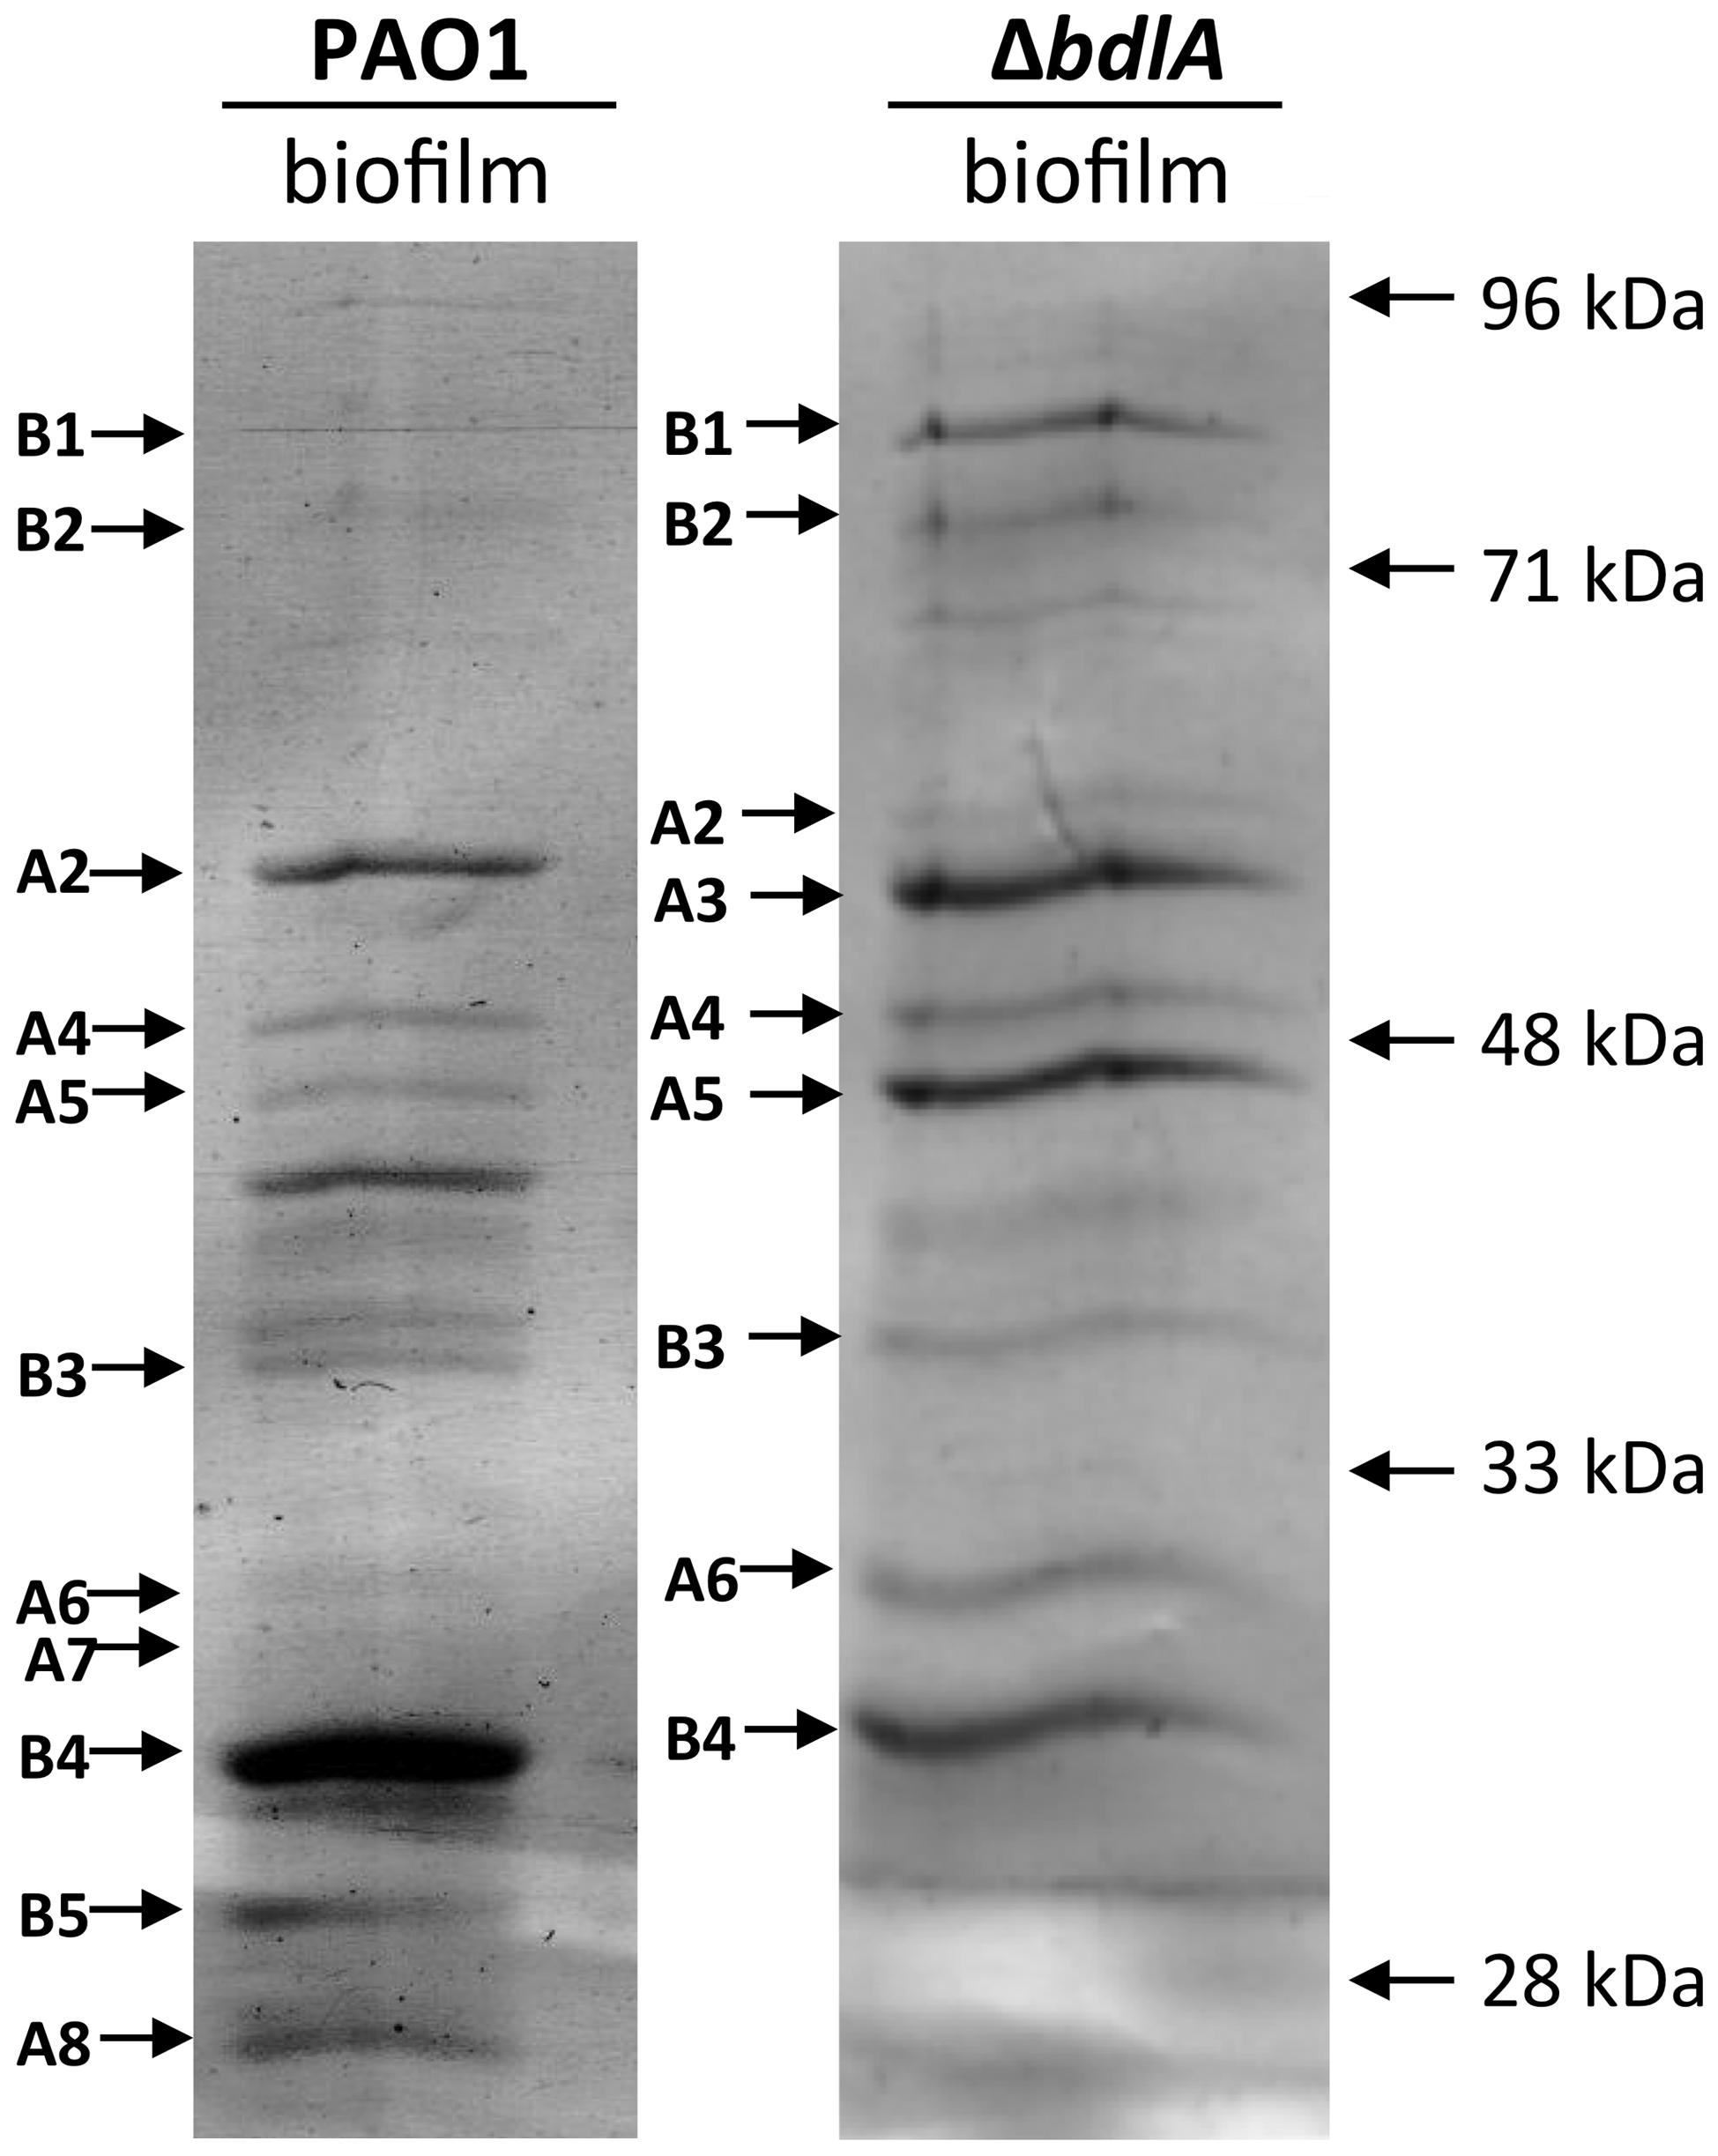 Analysis of proteins present in supernatants of <i>P.</i> aeruginosa PAO1 and <i>ΔbdlA</i> biofilms.